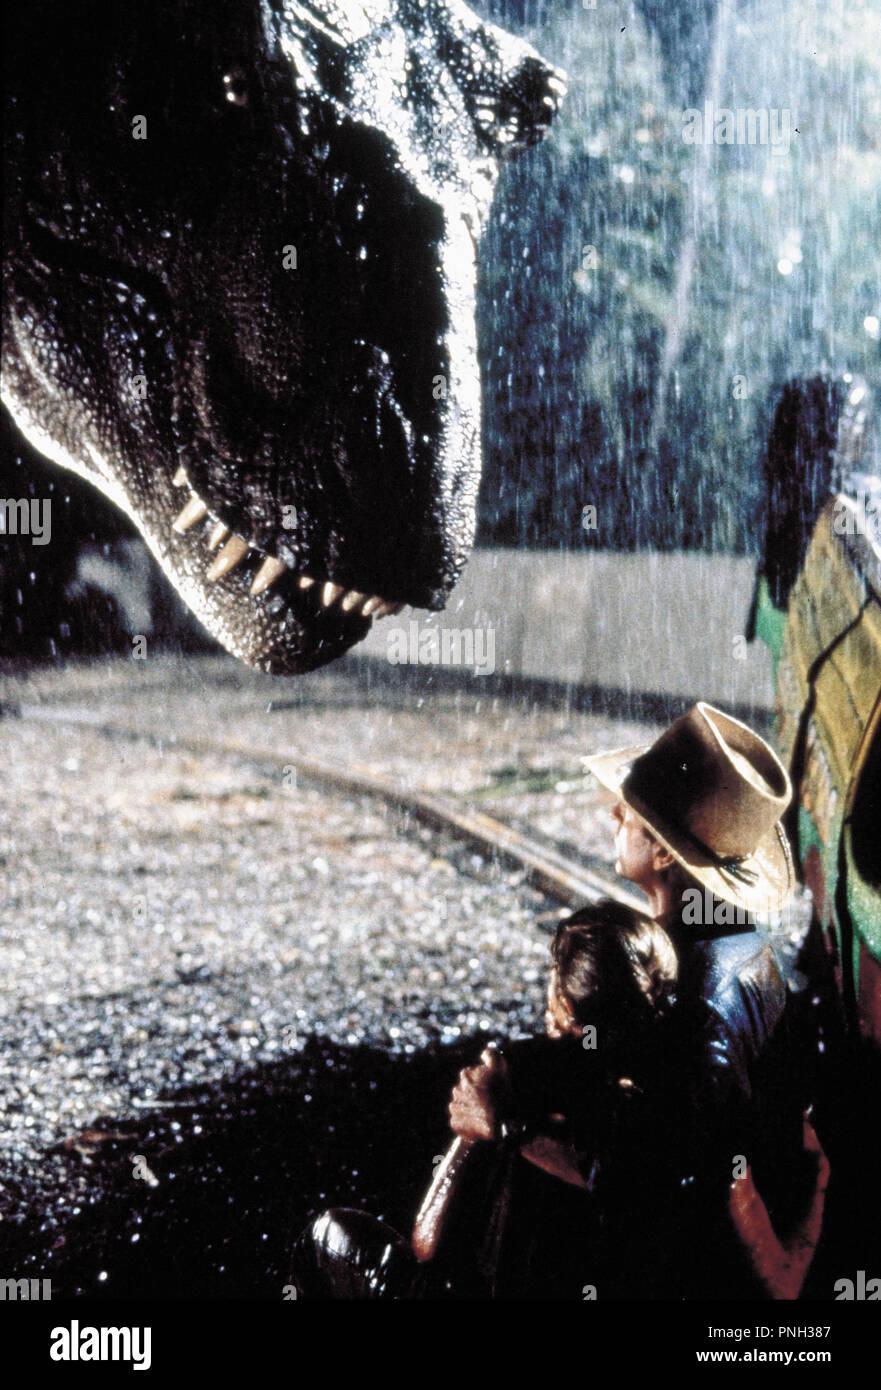 Original film title: JURASSIC PARK. English title: JURASSIC PARK. Year: 1993. Director: STEVEN SPIELBERG. Stars: SAM NEILL. Credit: AMBLIN/UNIVERSAL / Album - Stock Image